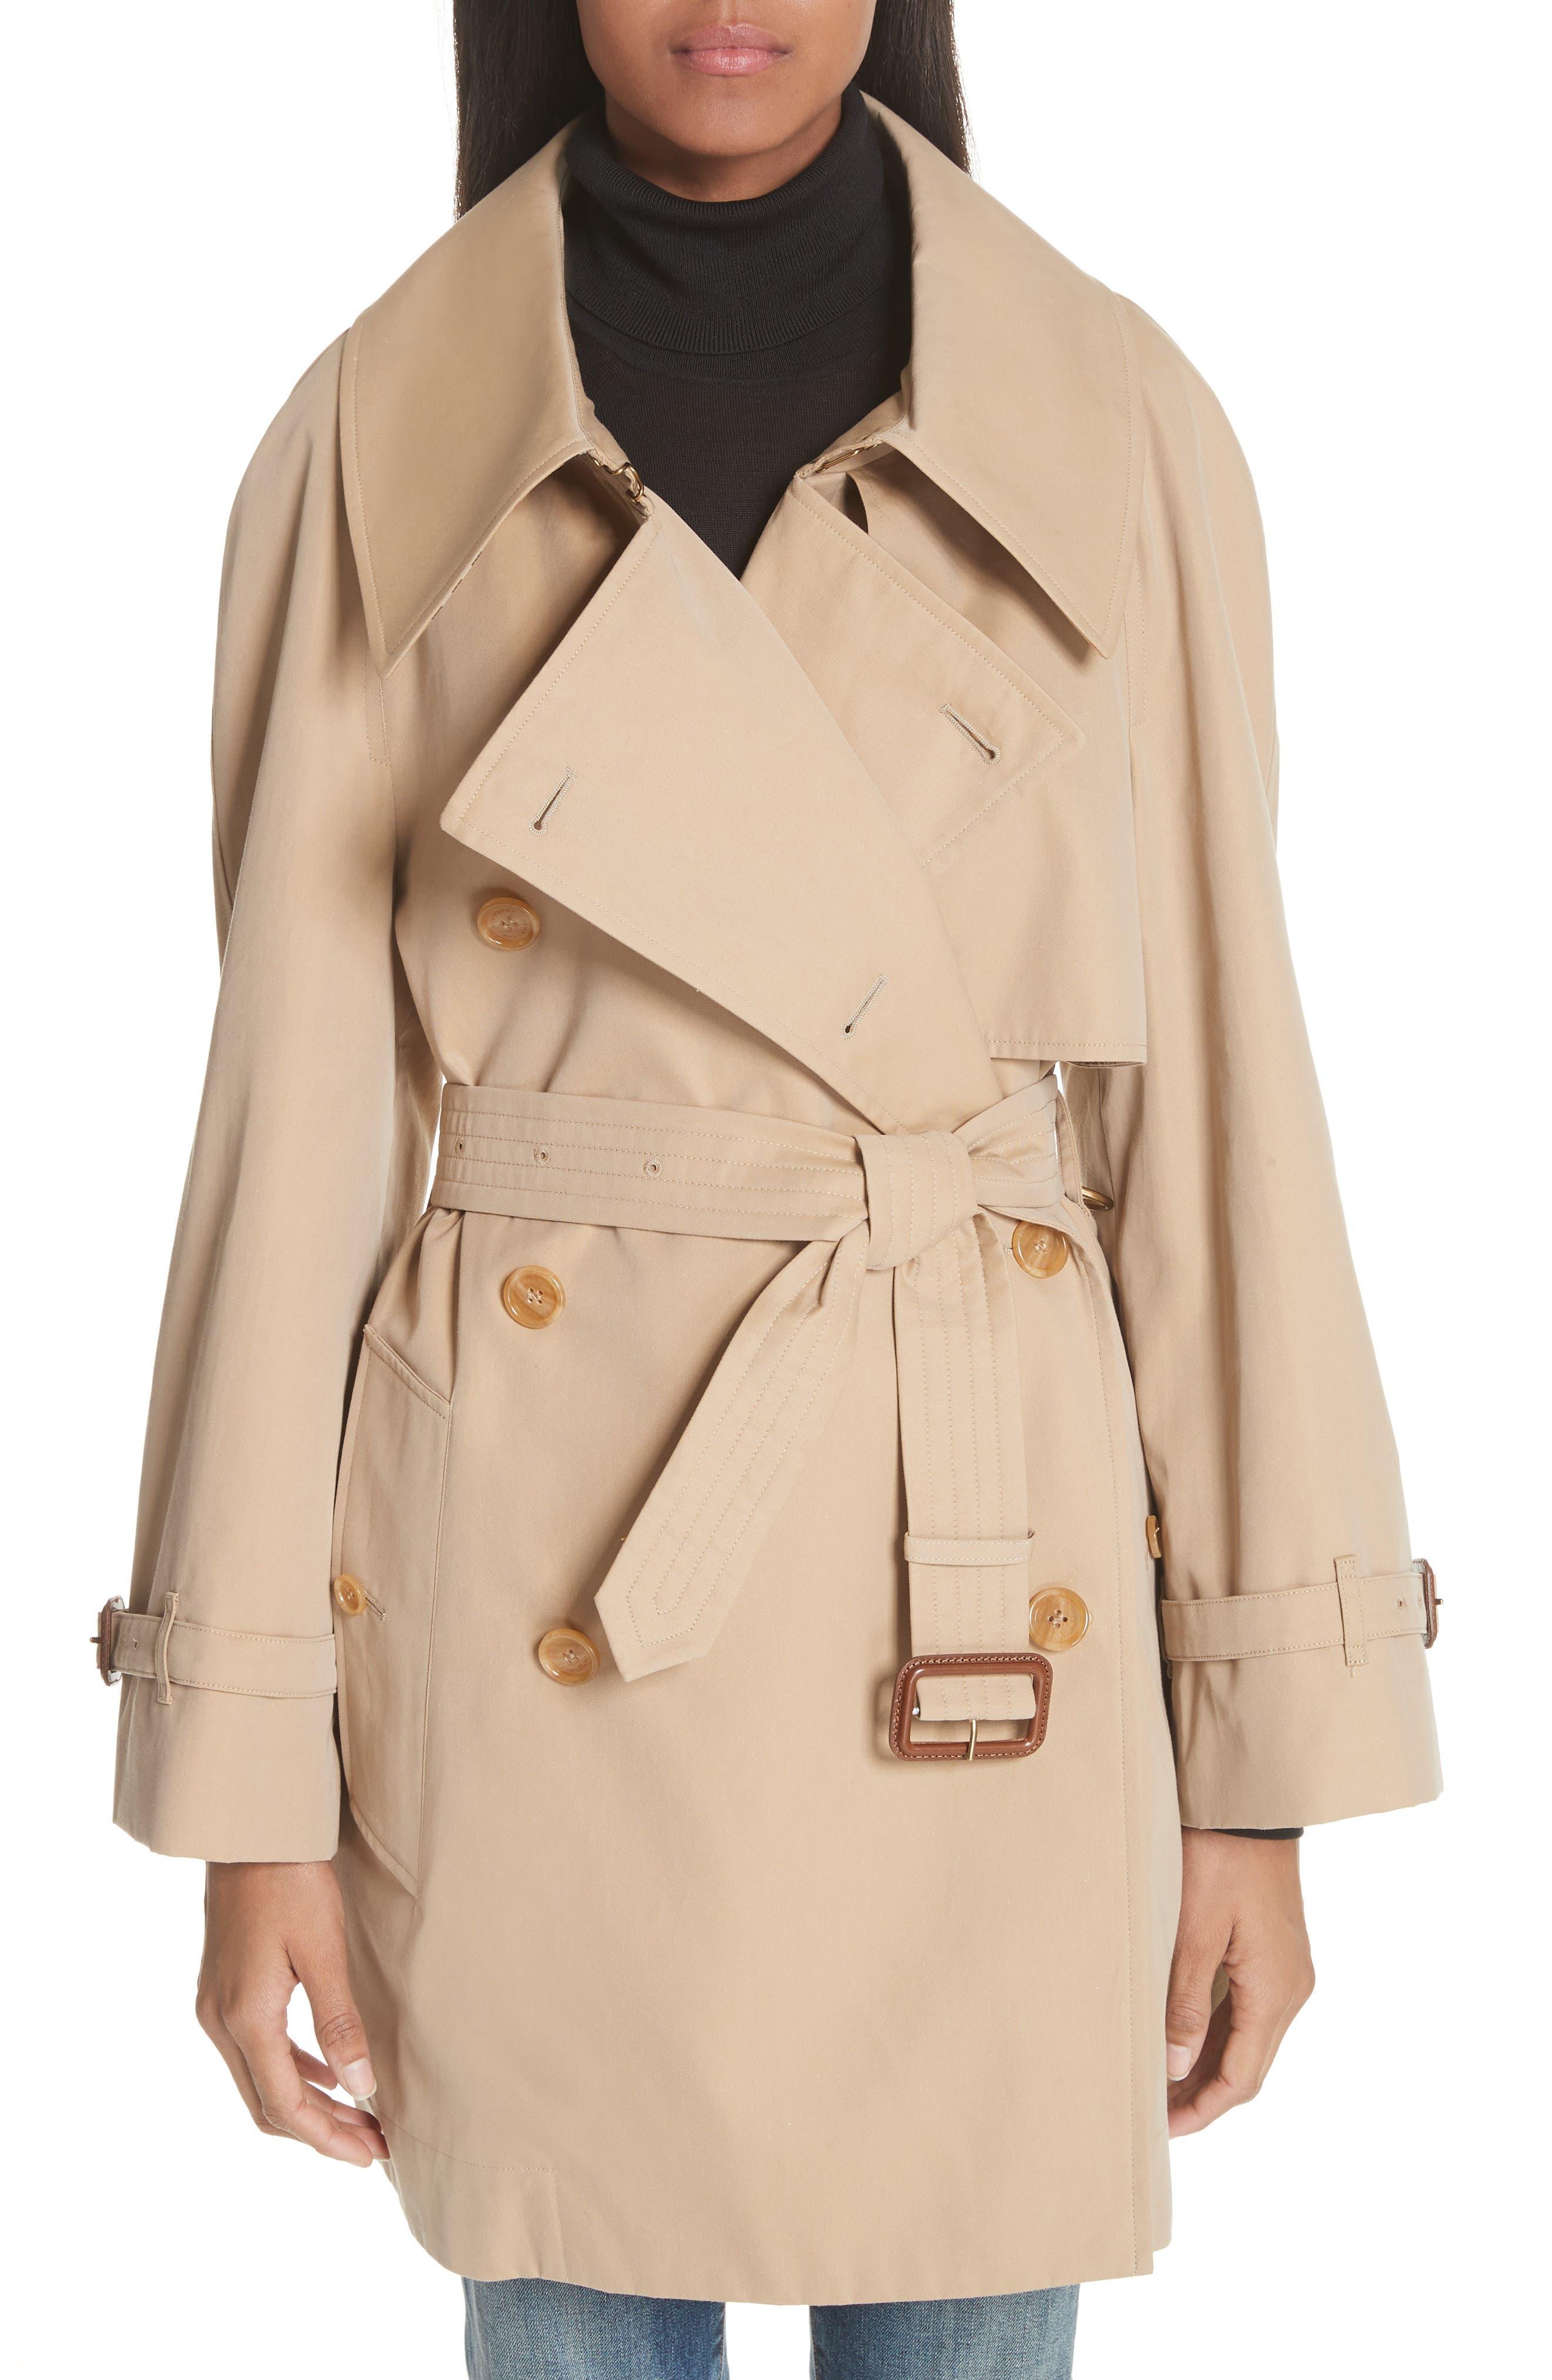 Fortingall Cotton Gabardine Trench Coat,                         Main,                         color, Honey